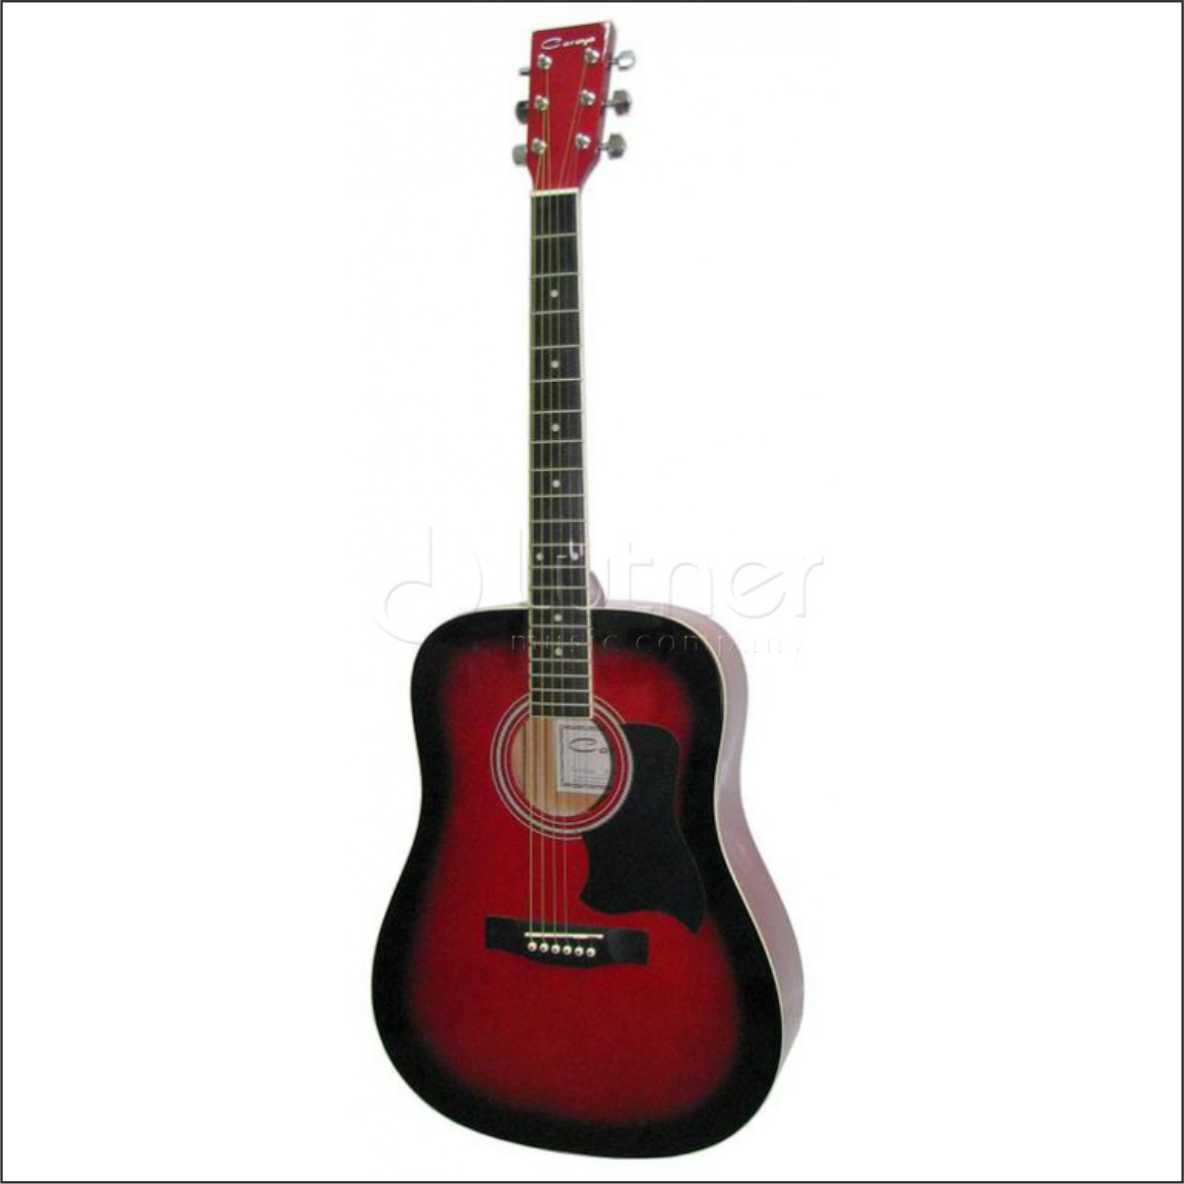 f630-rds-akusticheskaya-folk-gitara-41-caraya